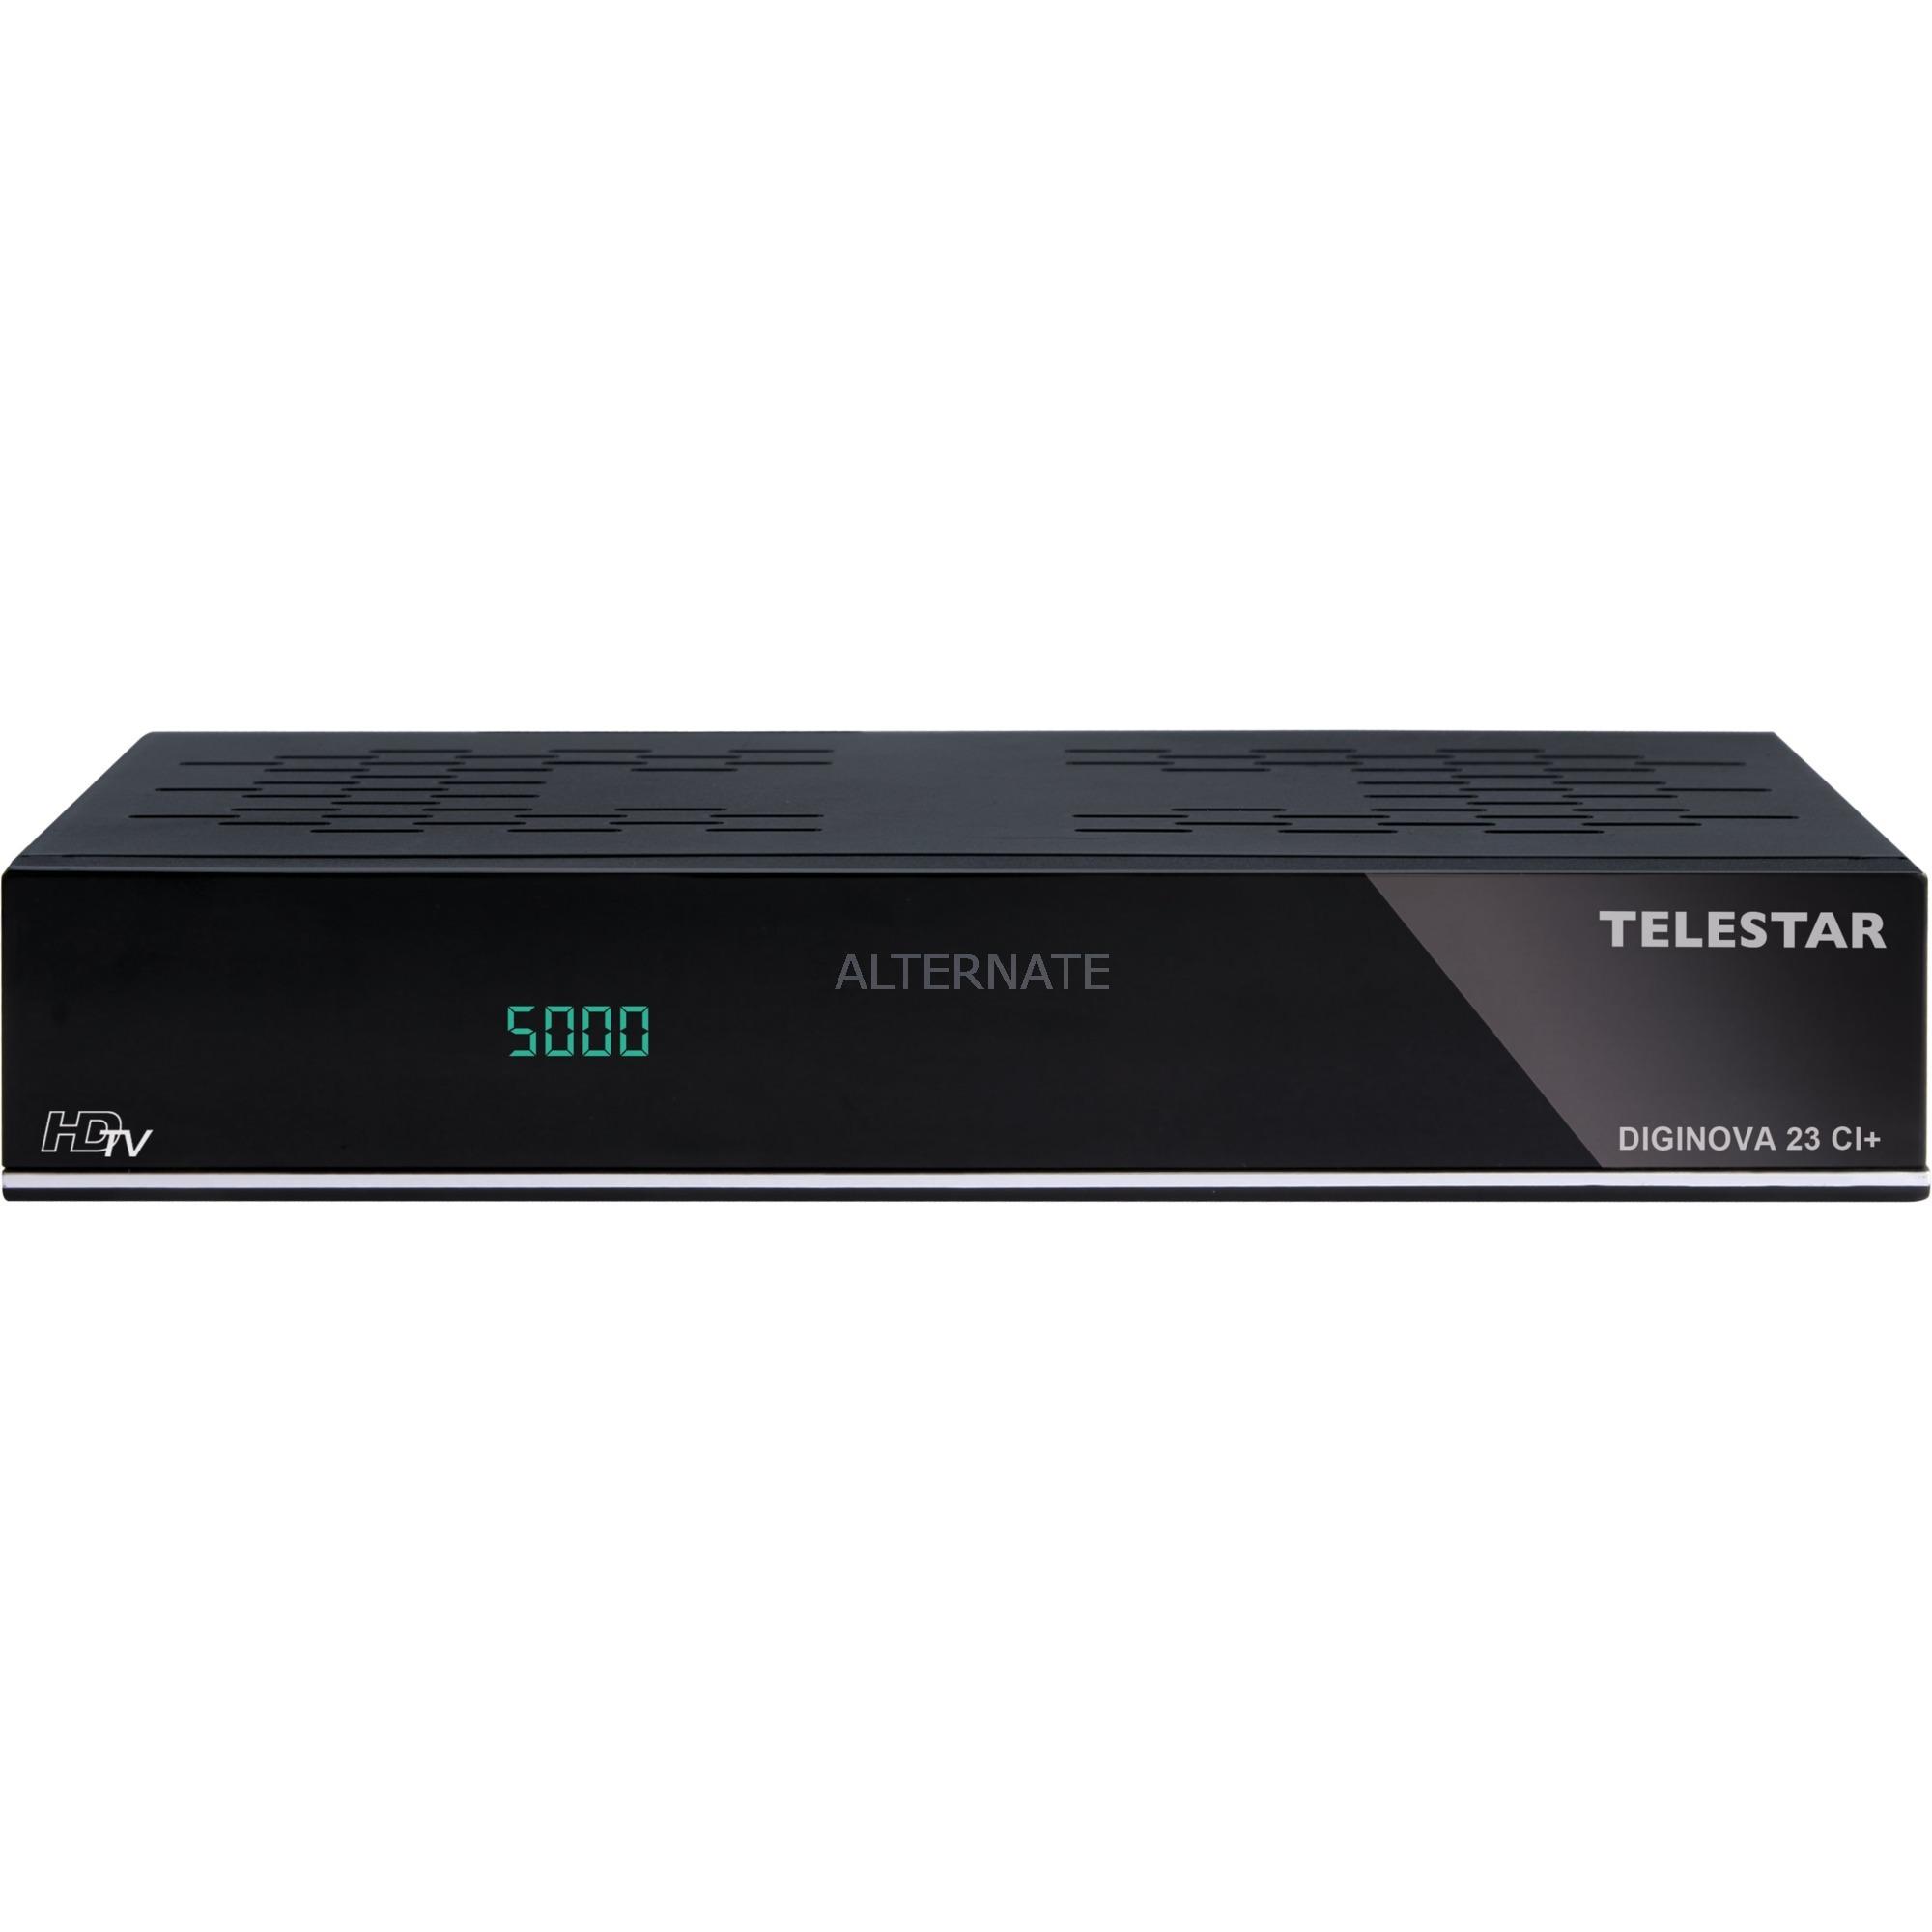 DIGINOVA 23 CI+ tV set-top boxes, Receptor de satélite